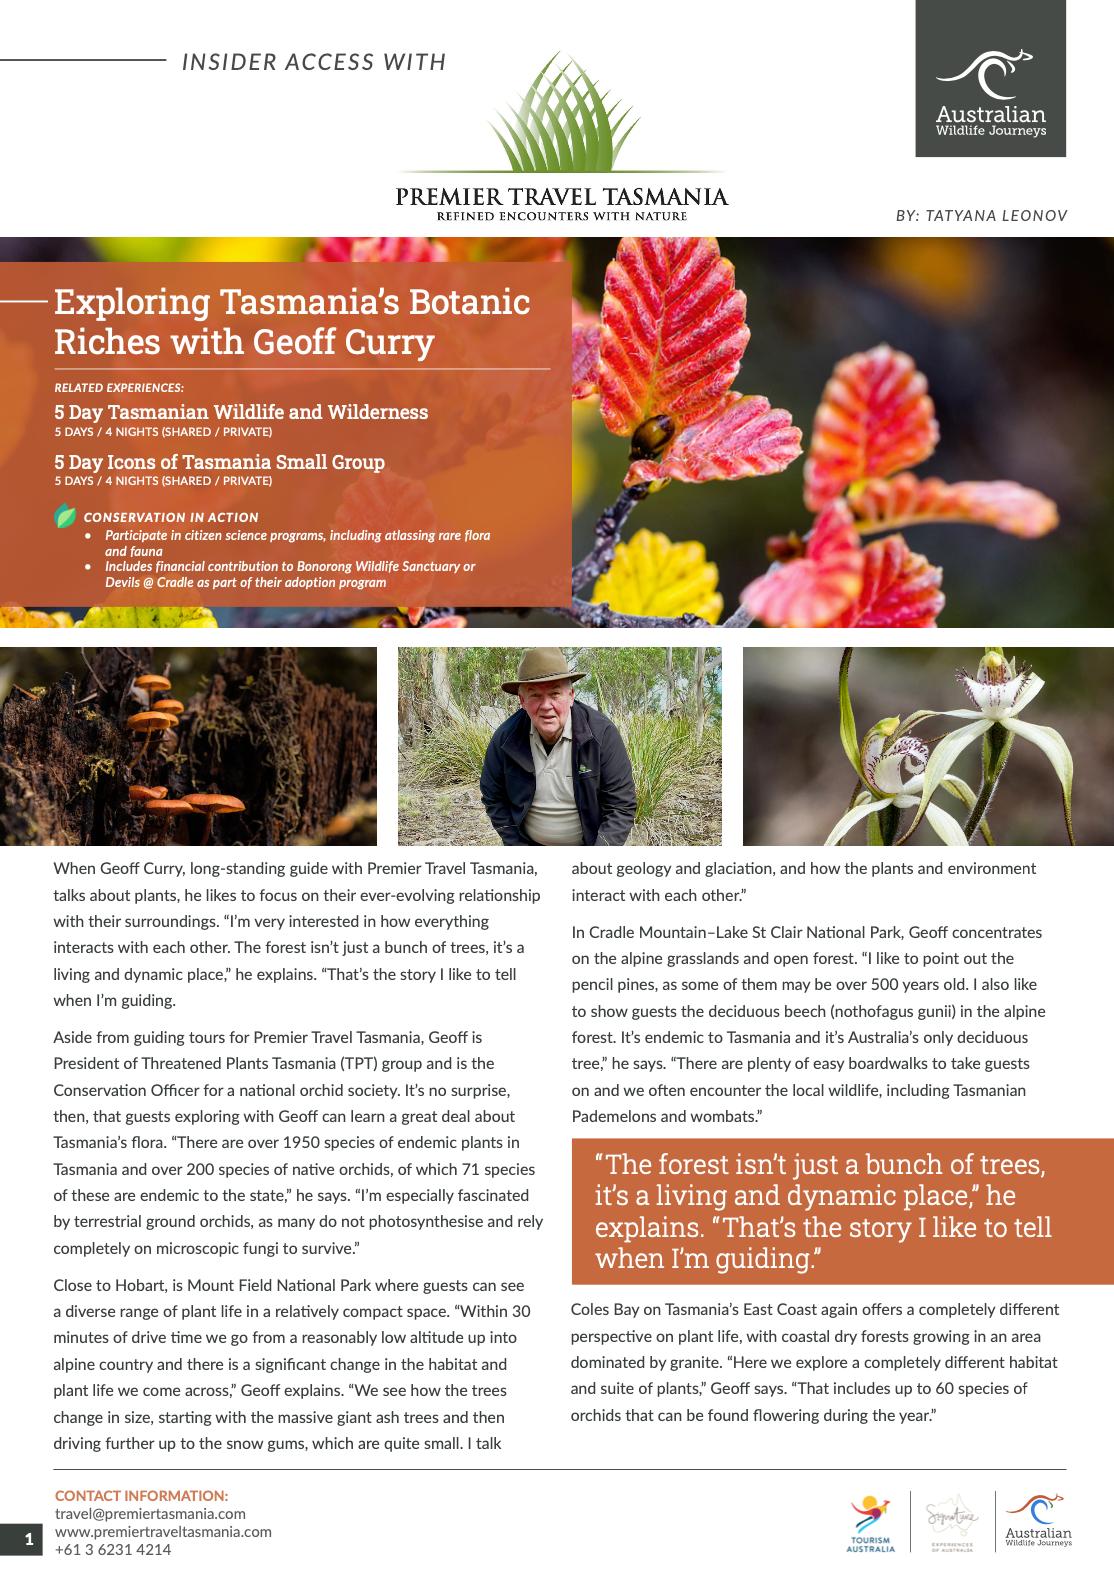 Premier Travel Tasmania - Insider Access